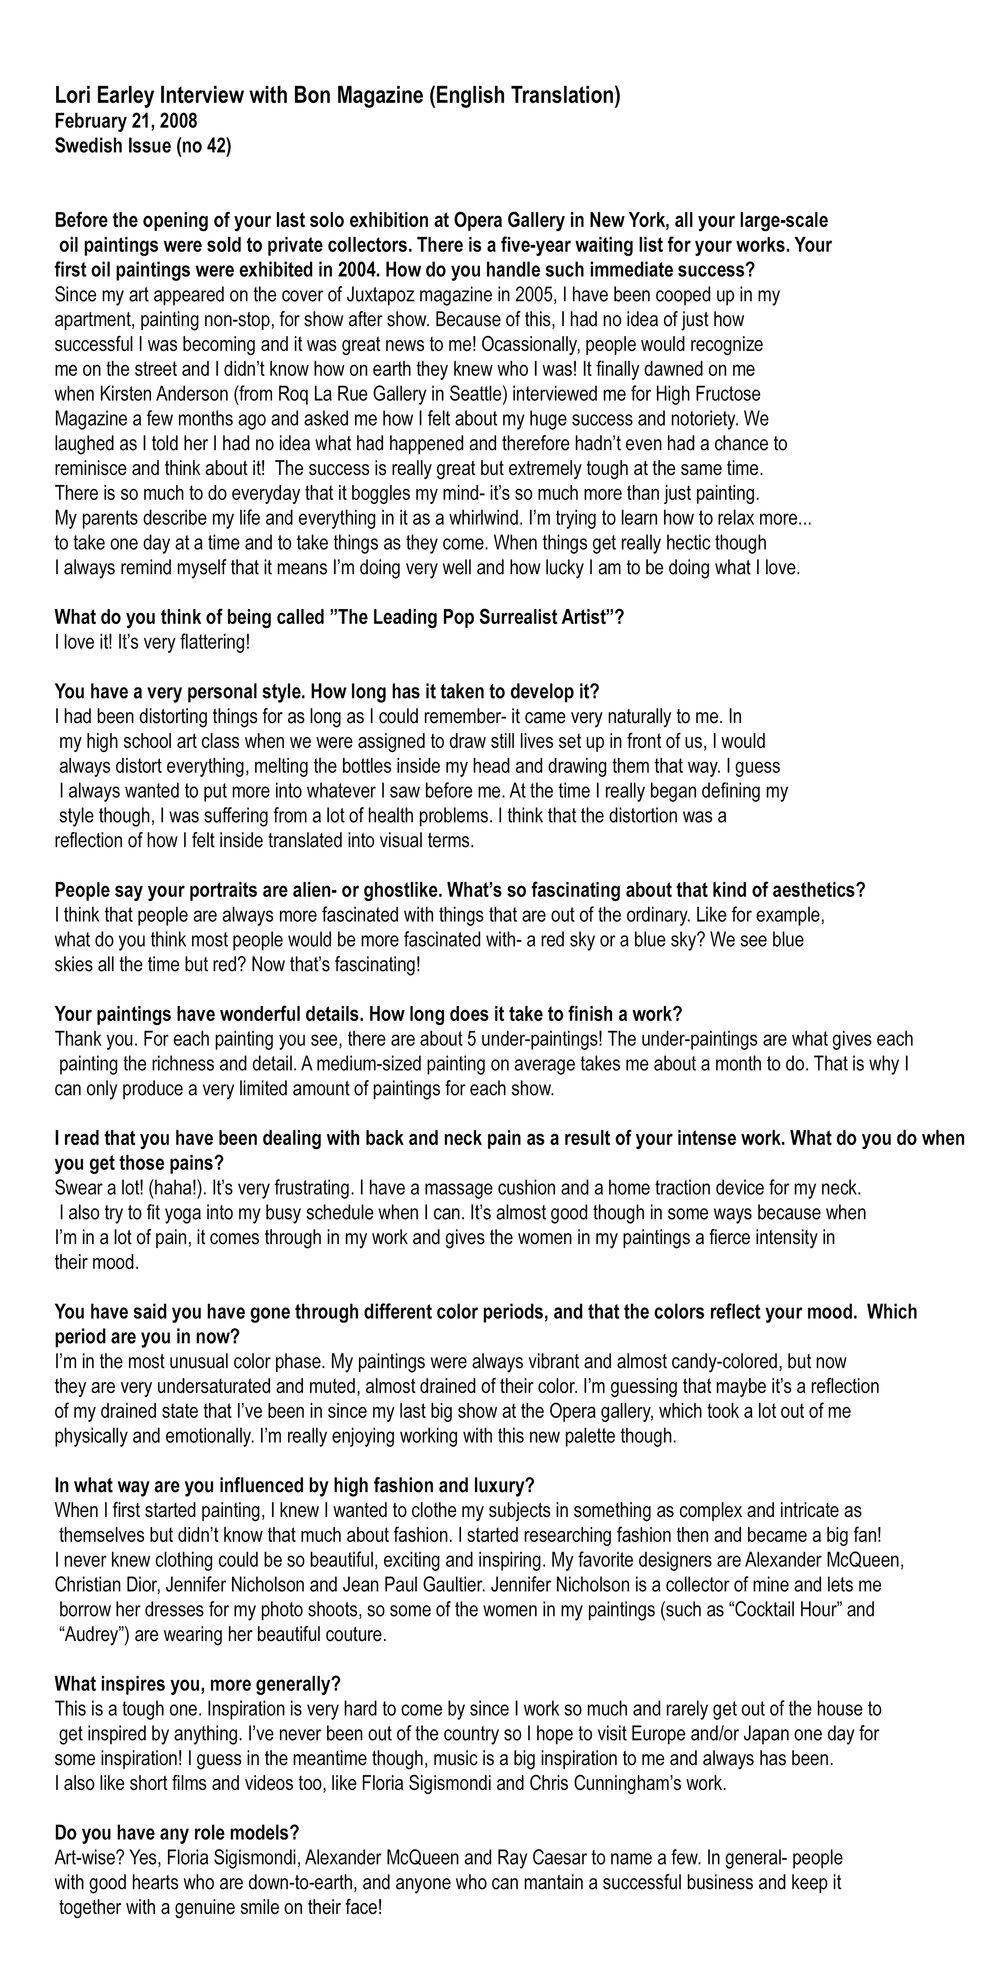 Bon Magazine 2008 Interview text.jpg